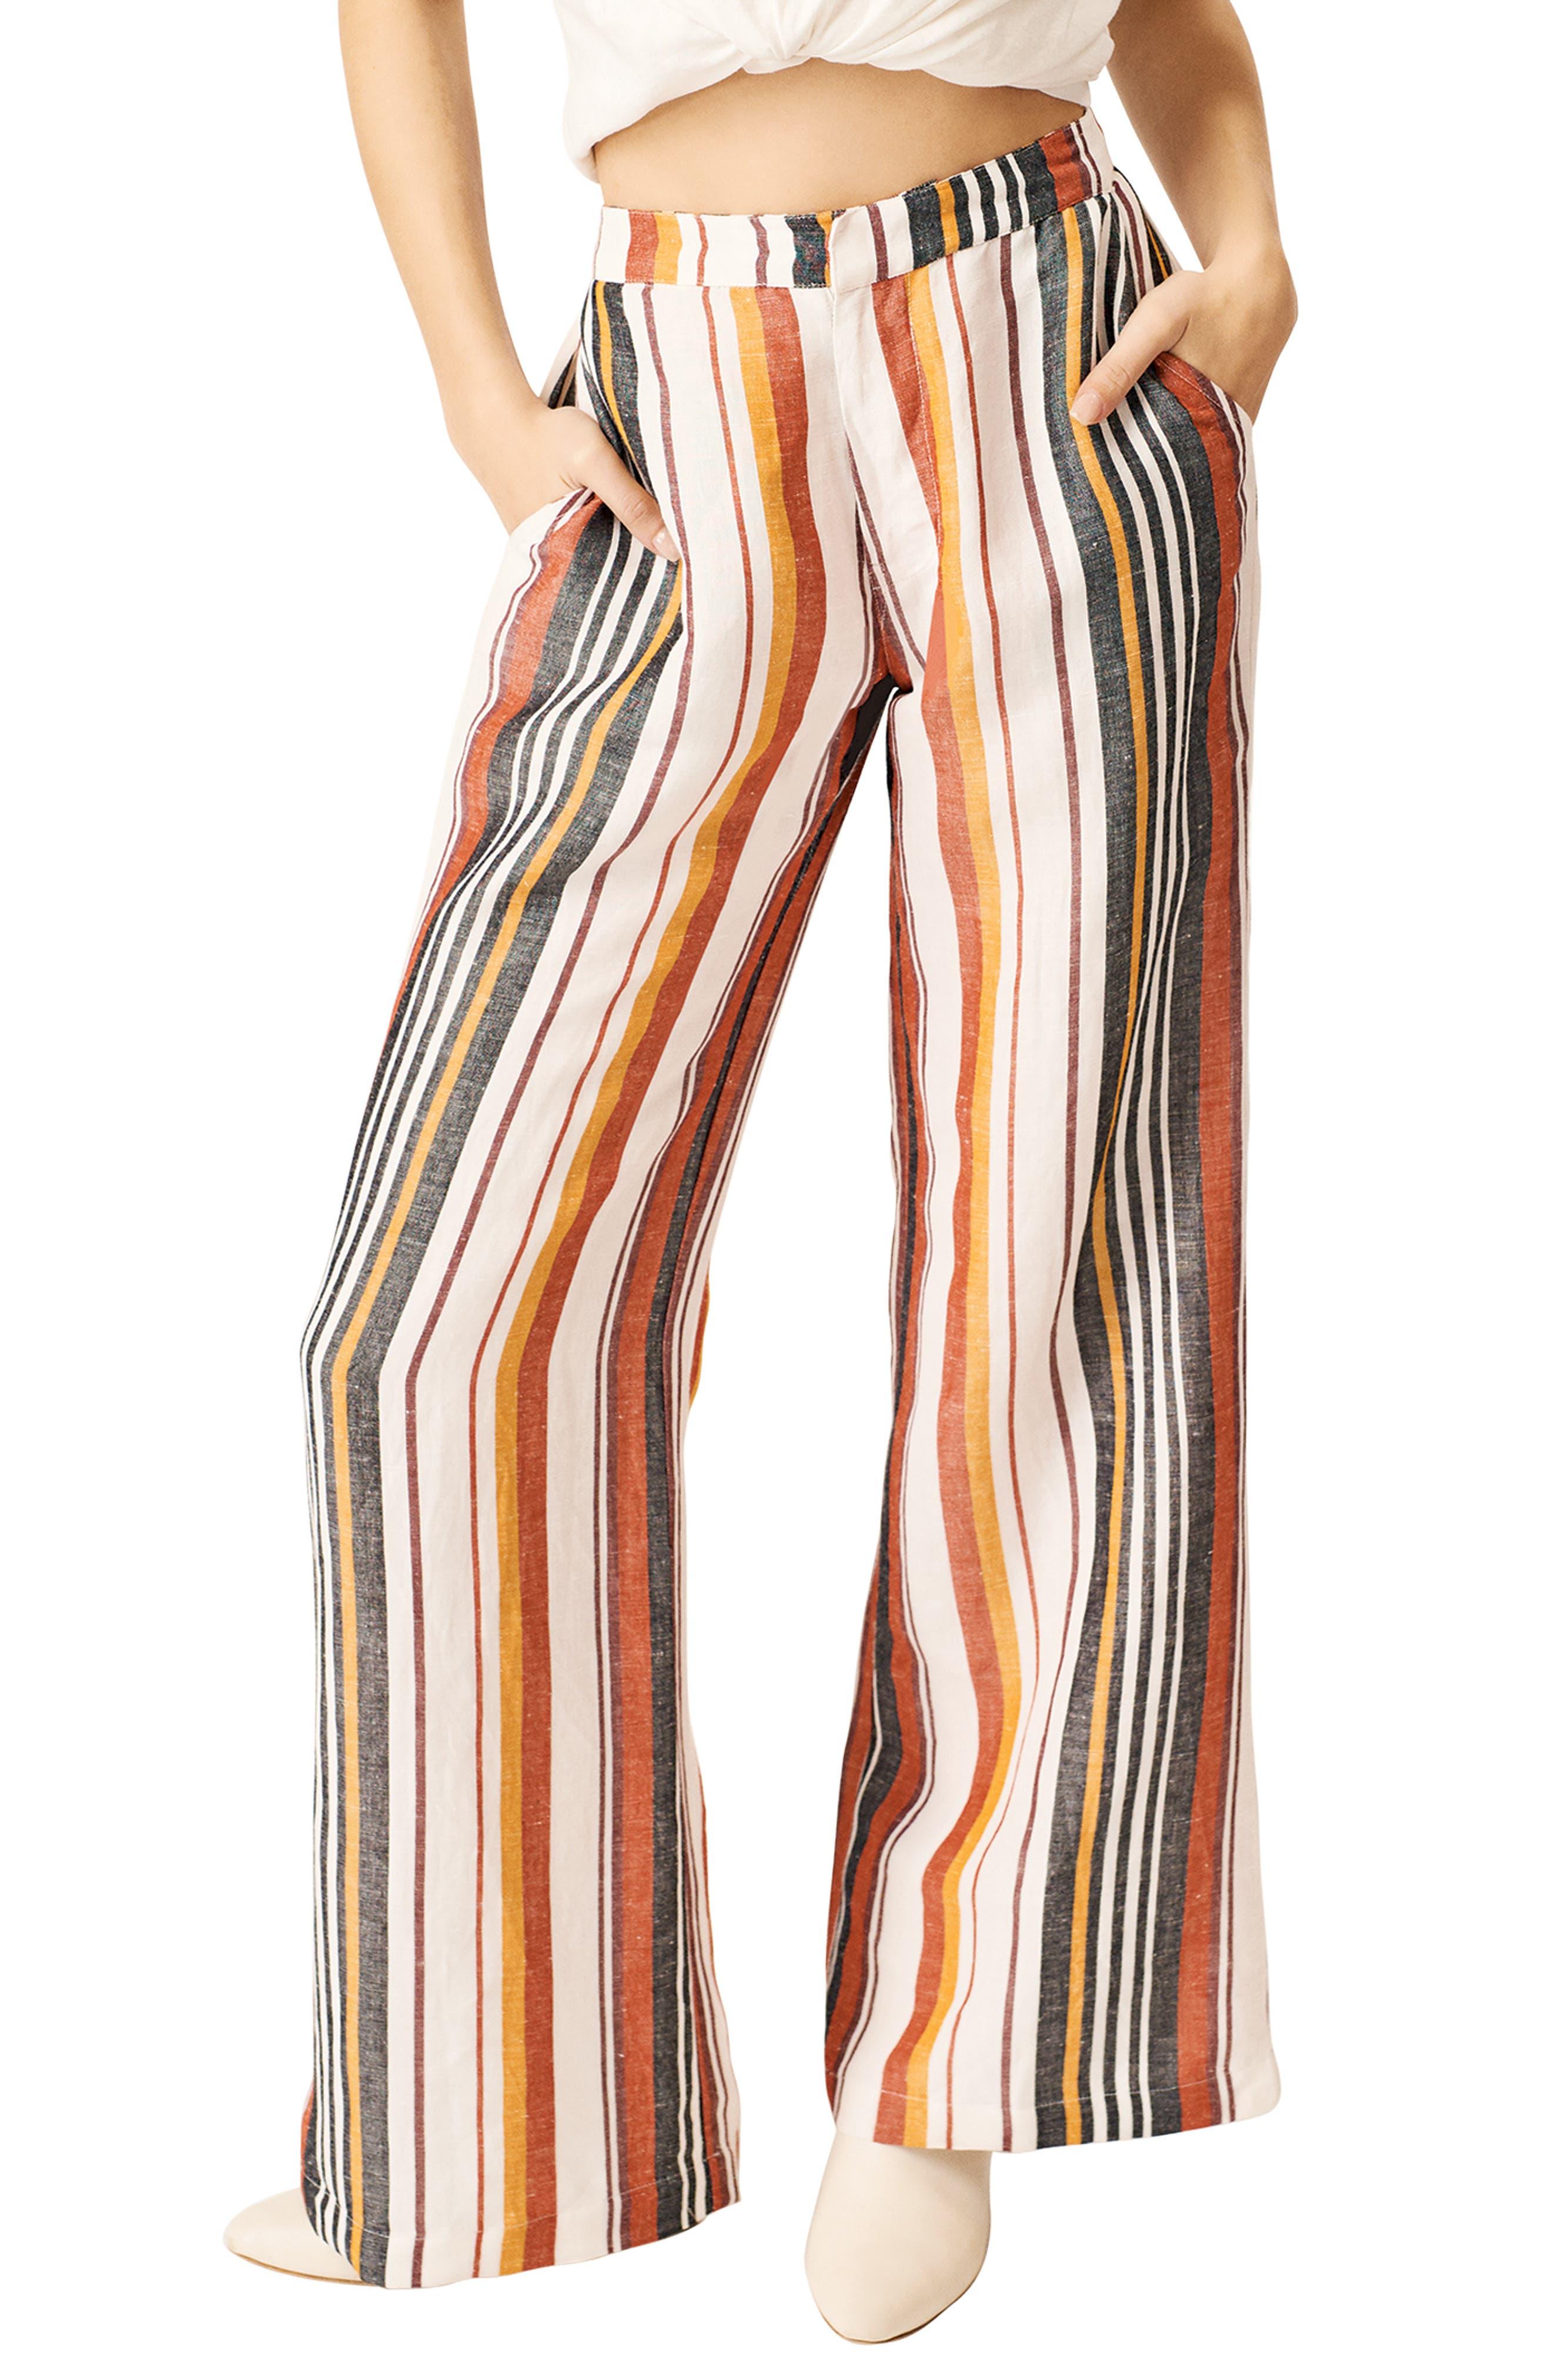 Vintage High Waisted Trousers, Sailor Pants, Jeans Womens Stone Row Hook It Up Stripe Pants $88.00 AT vintagedancer.com